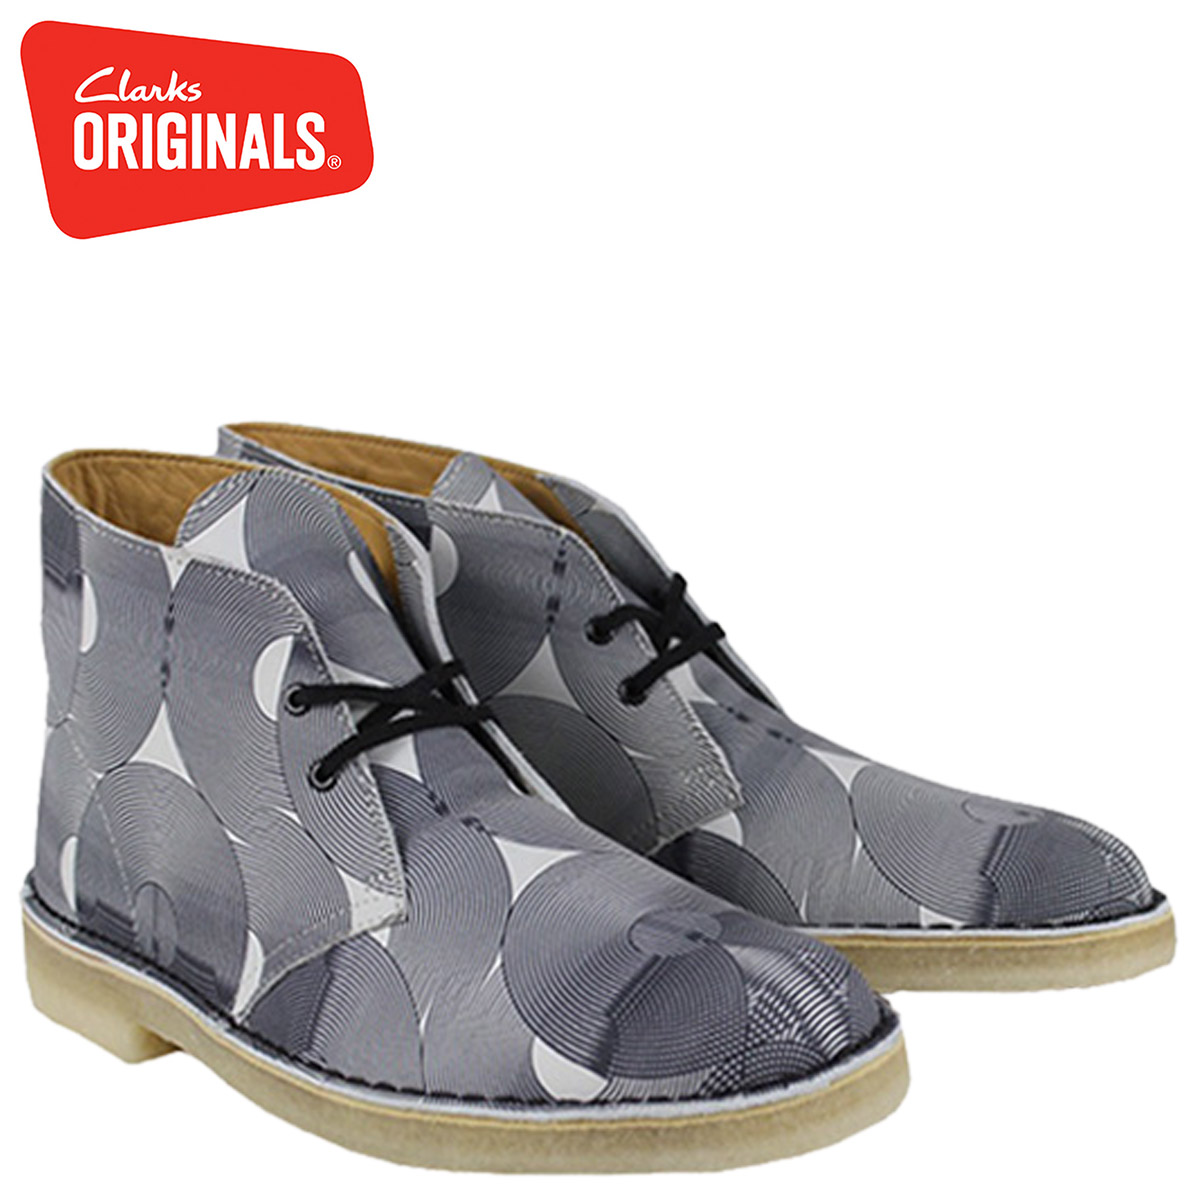 Clarks ORIGINALS kulaki originals desert boots DESERT BOOT 63709 men